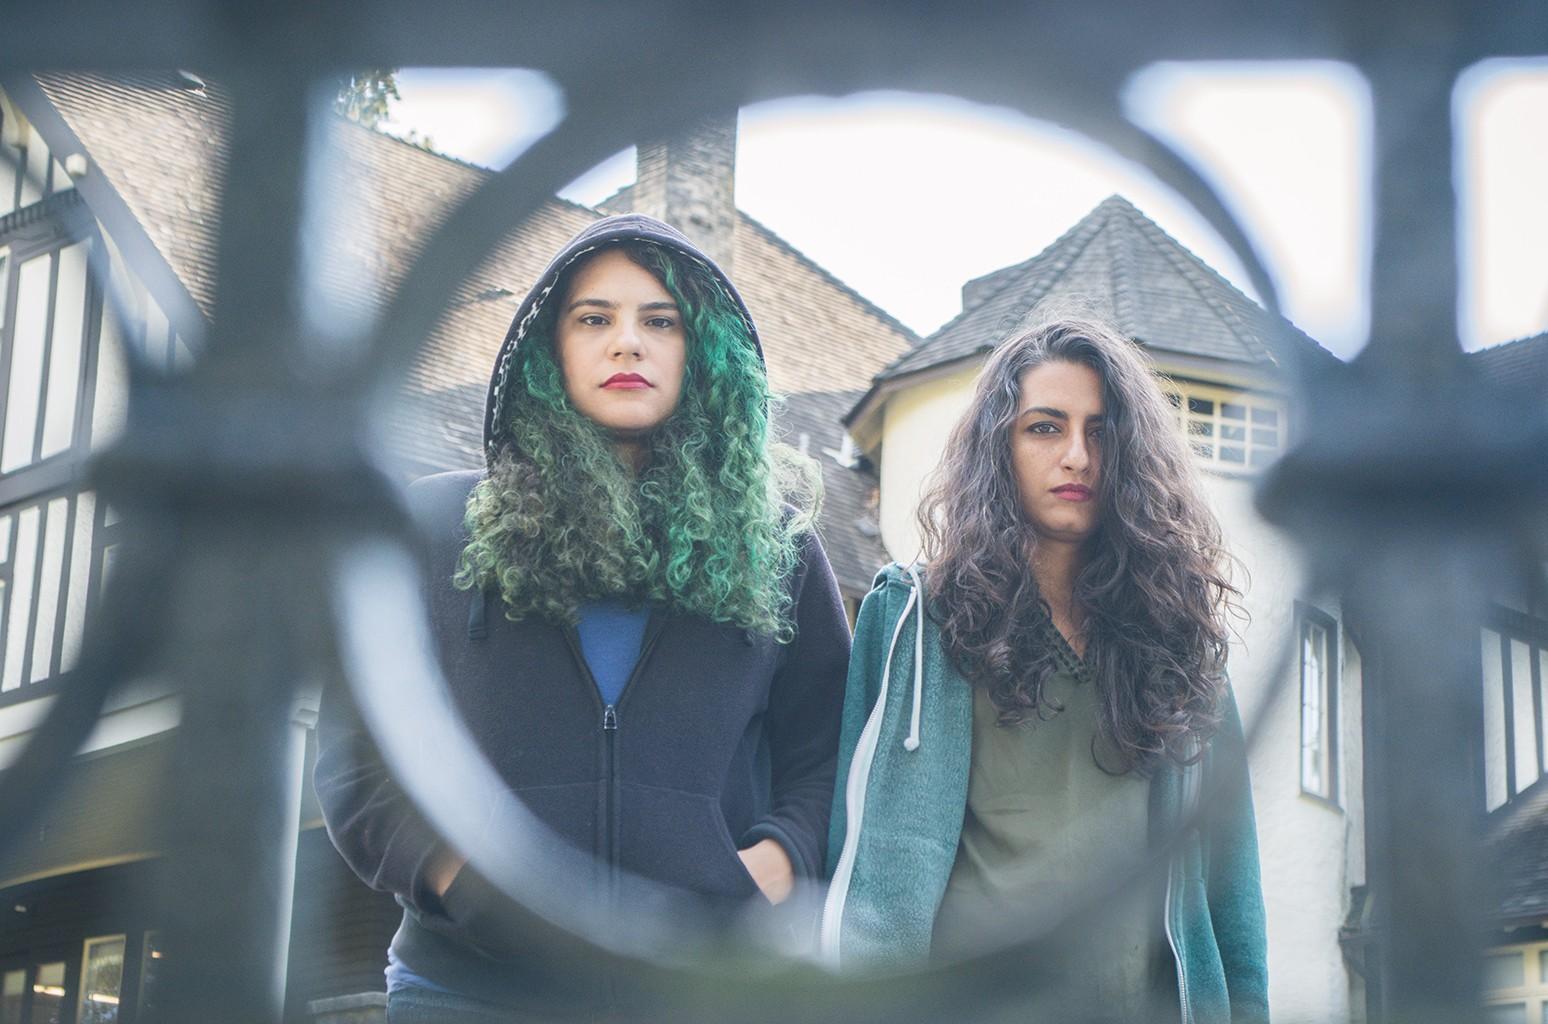 Cherine Amr and Nancy Mounir of Massive Scar Era